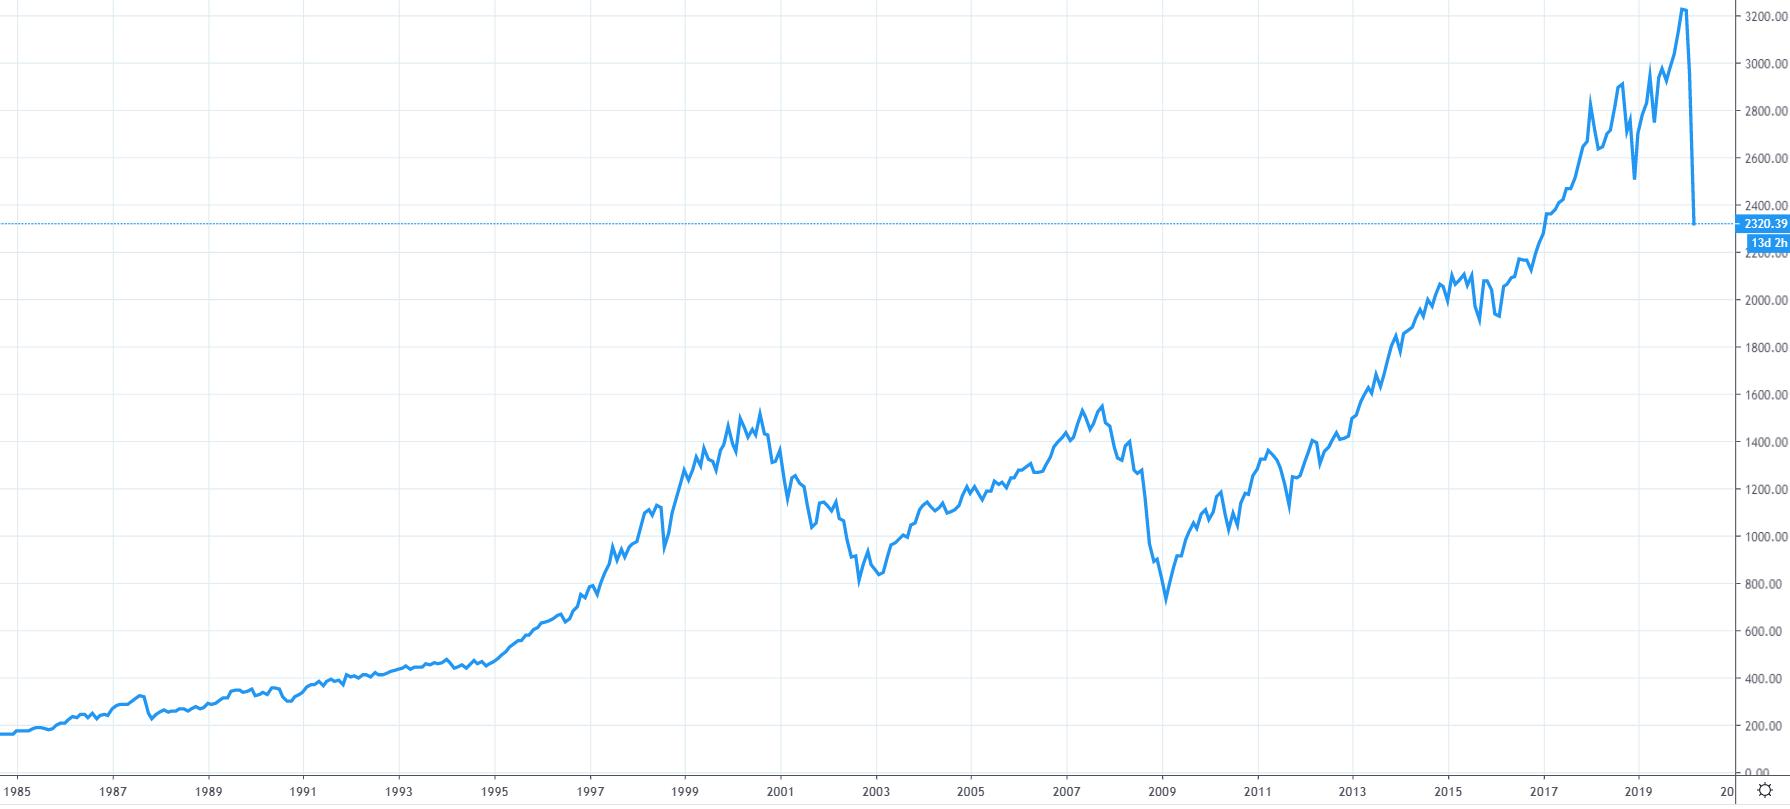 Graf indexu S&P 500